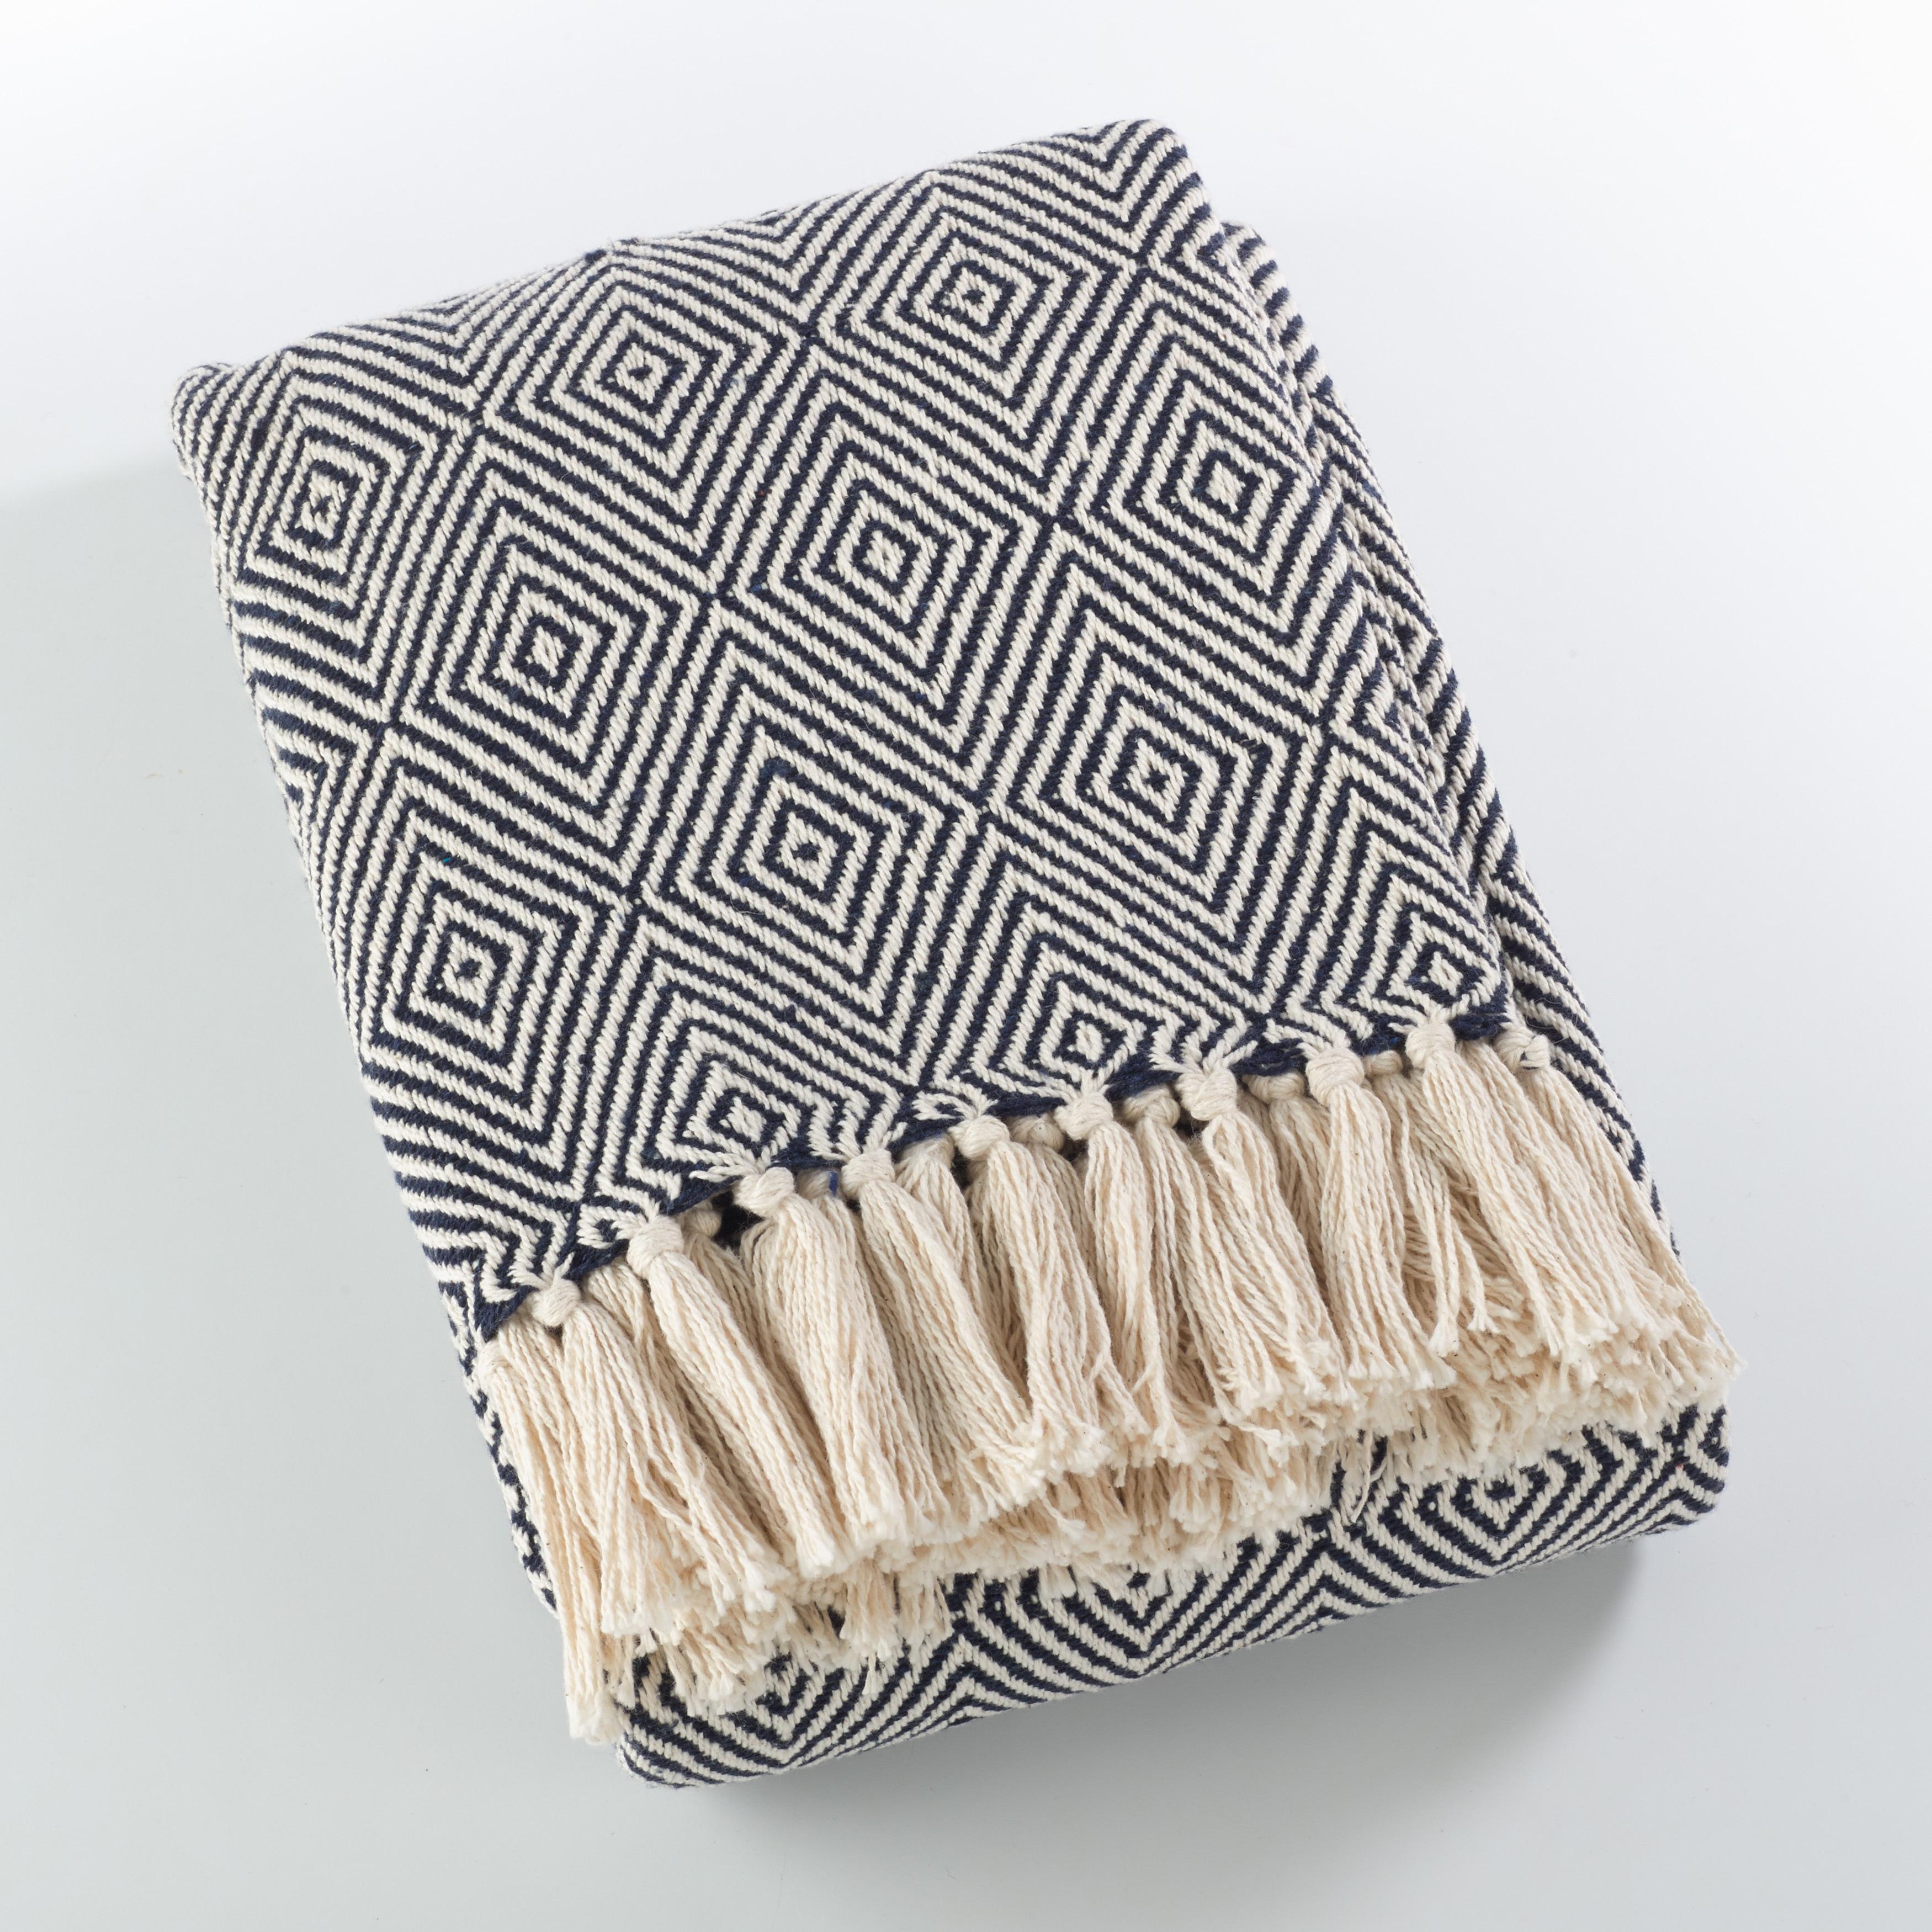 7c8173dbf Cotton Throw Blanket With Diamond Weave Design